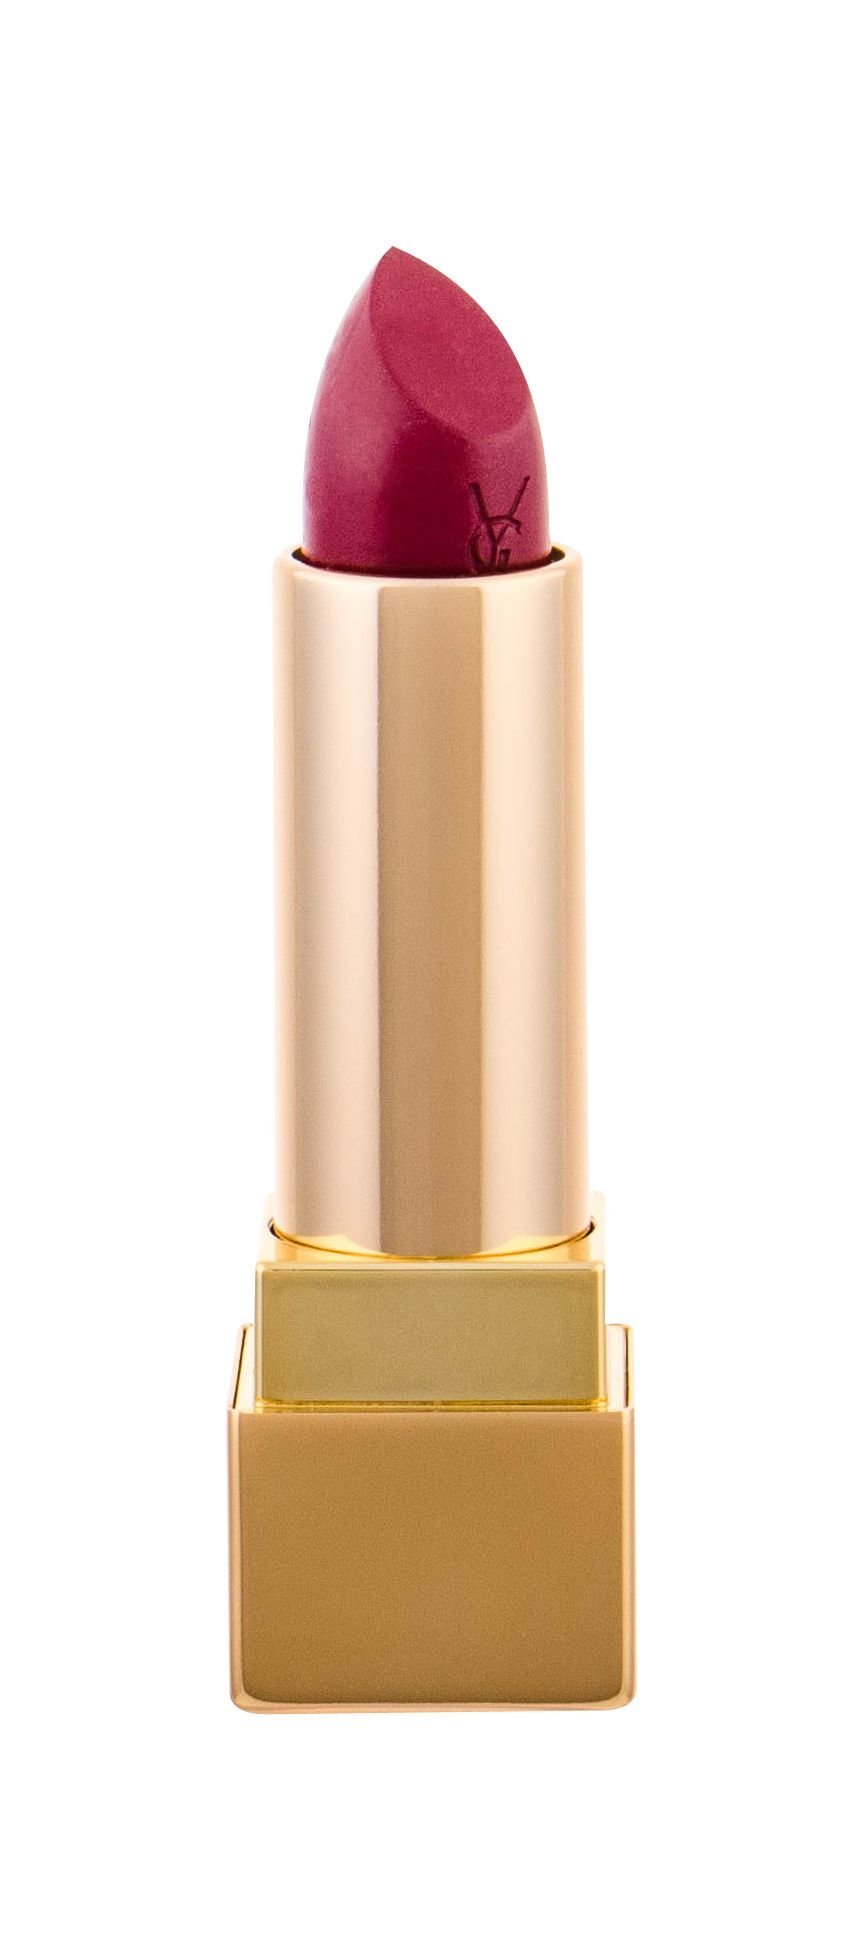 Yves Saint Laurent Rouge Pur Couture Lipstick 3,8ml 09 Rose Stilleto